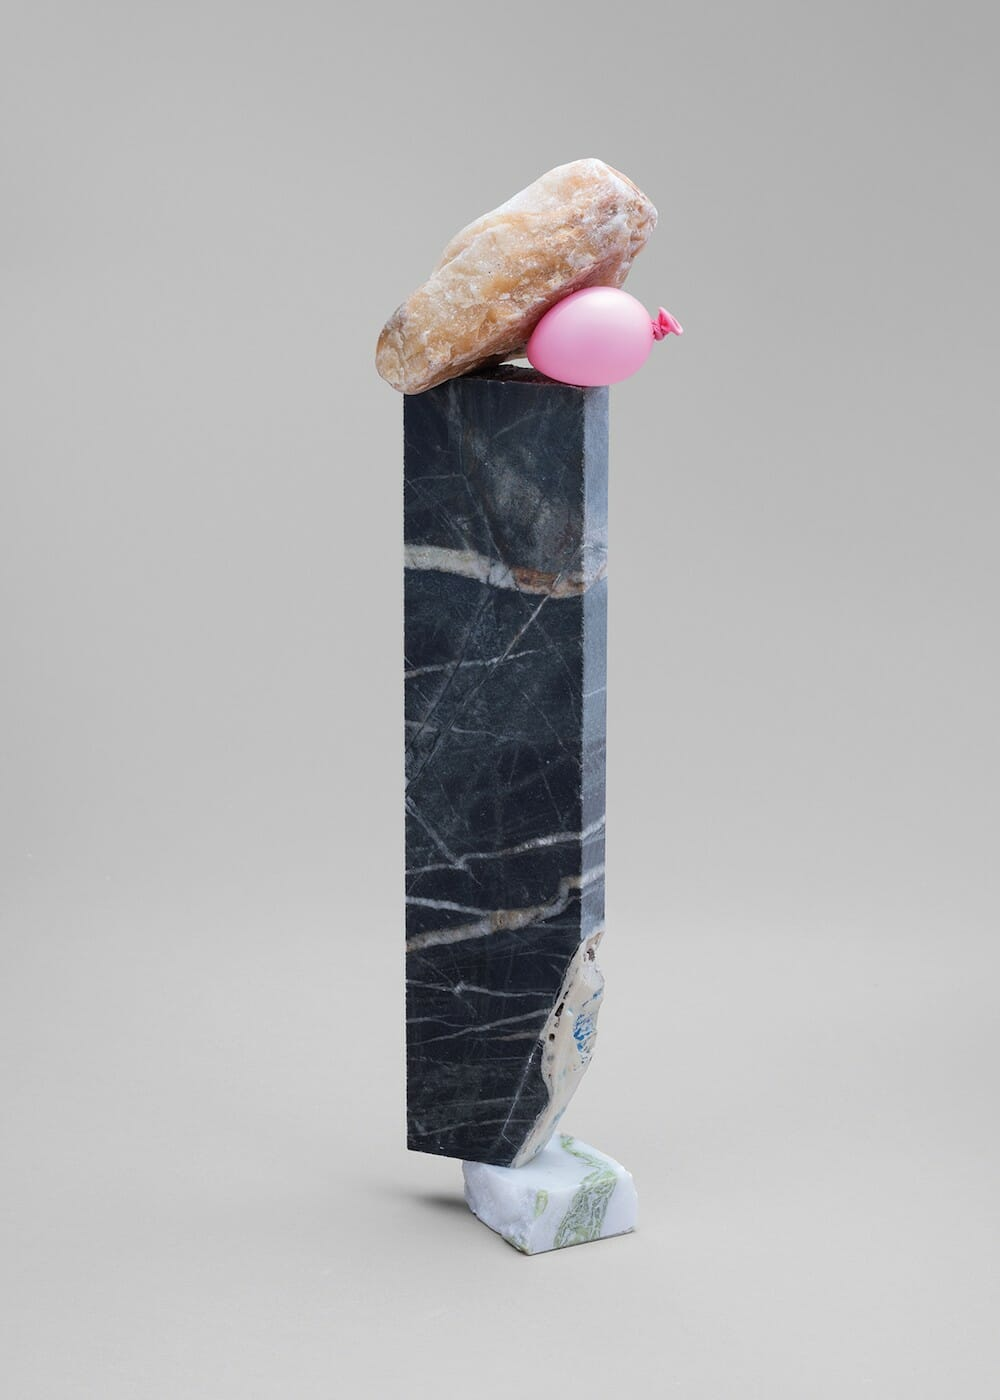 ballon de baudruche par Daniel Forero